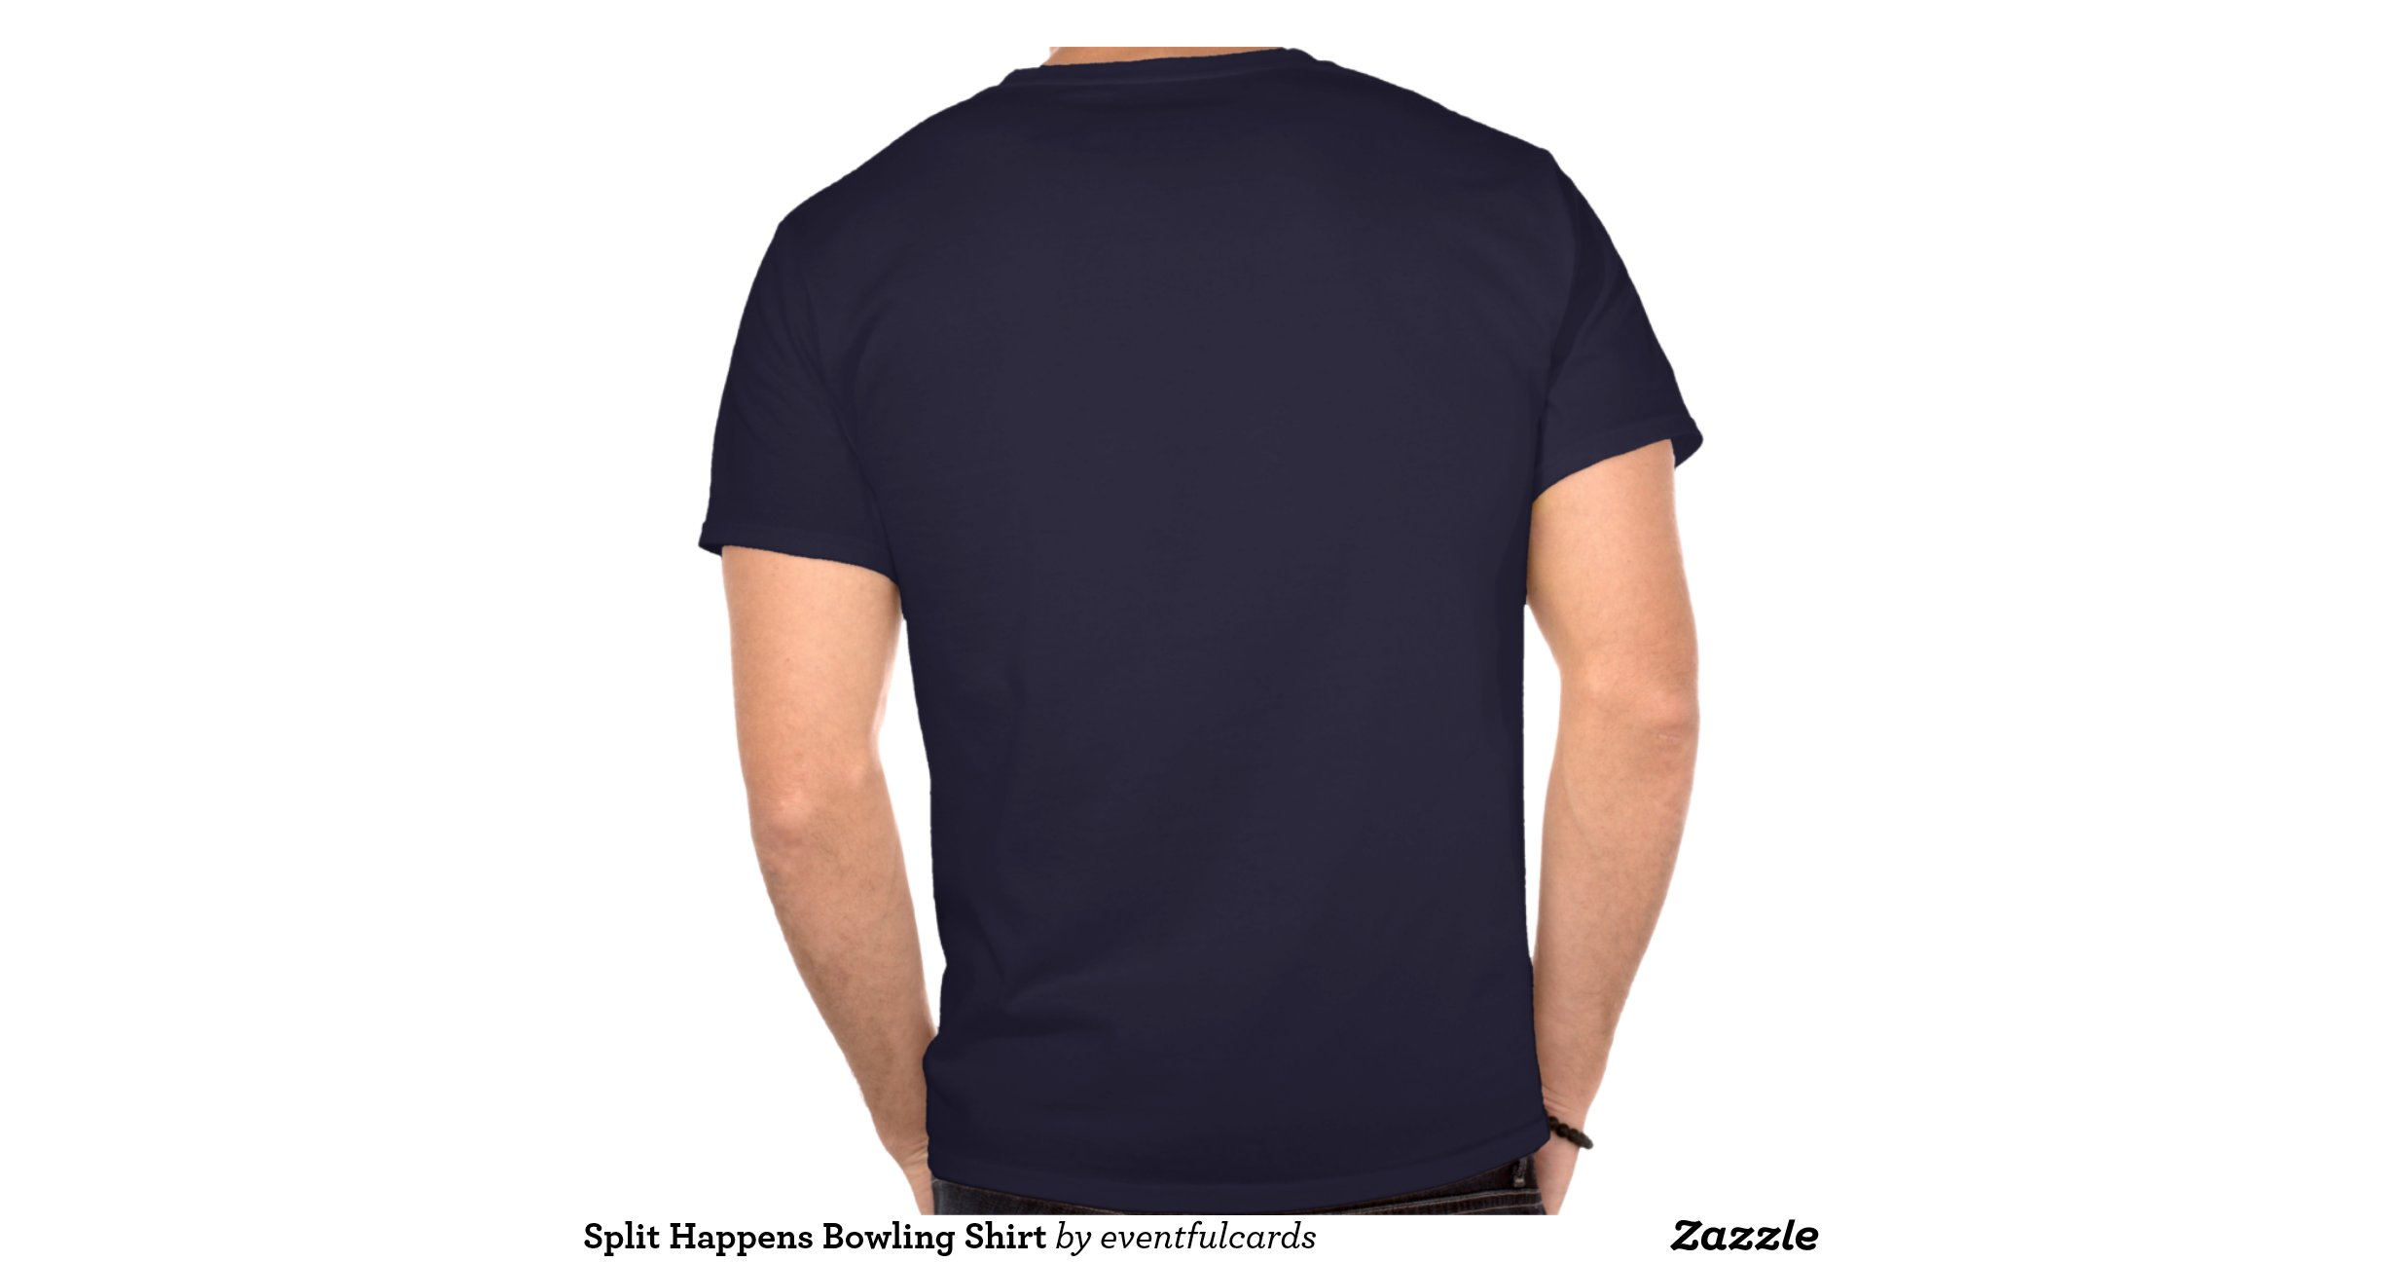 Split Happens Bowling Shirt |